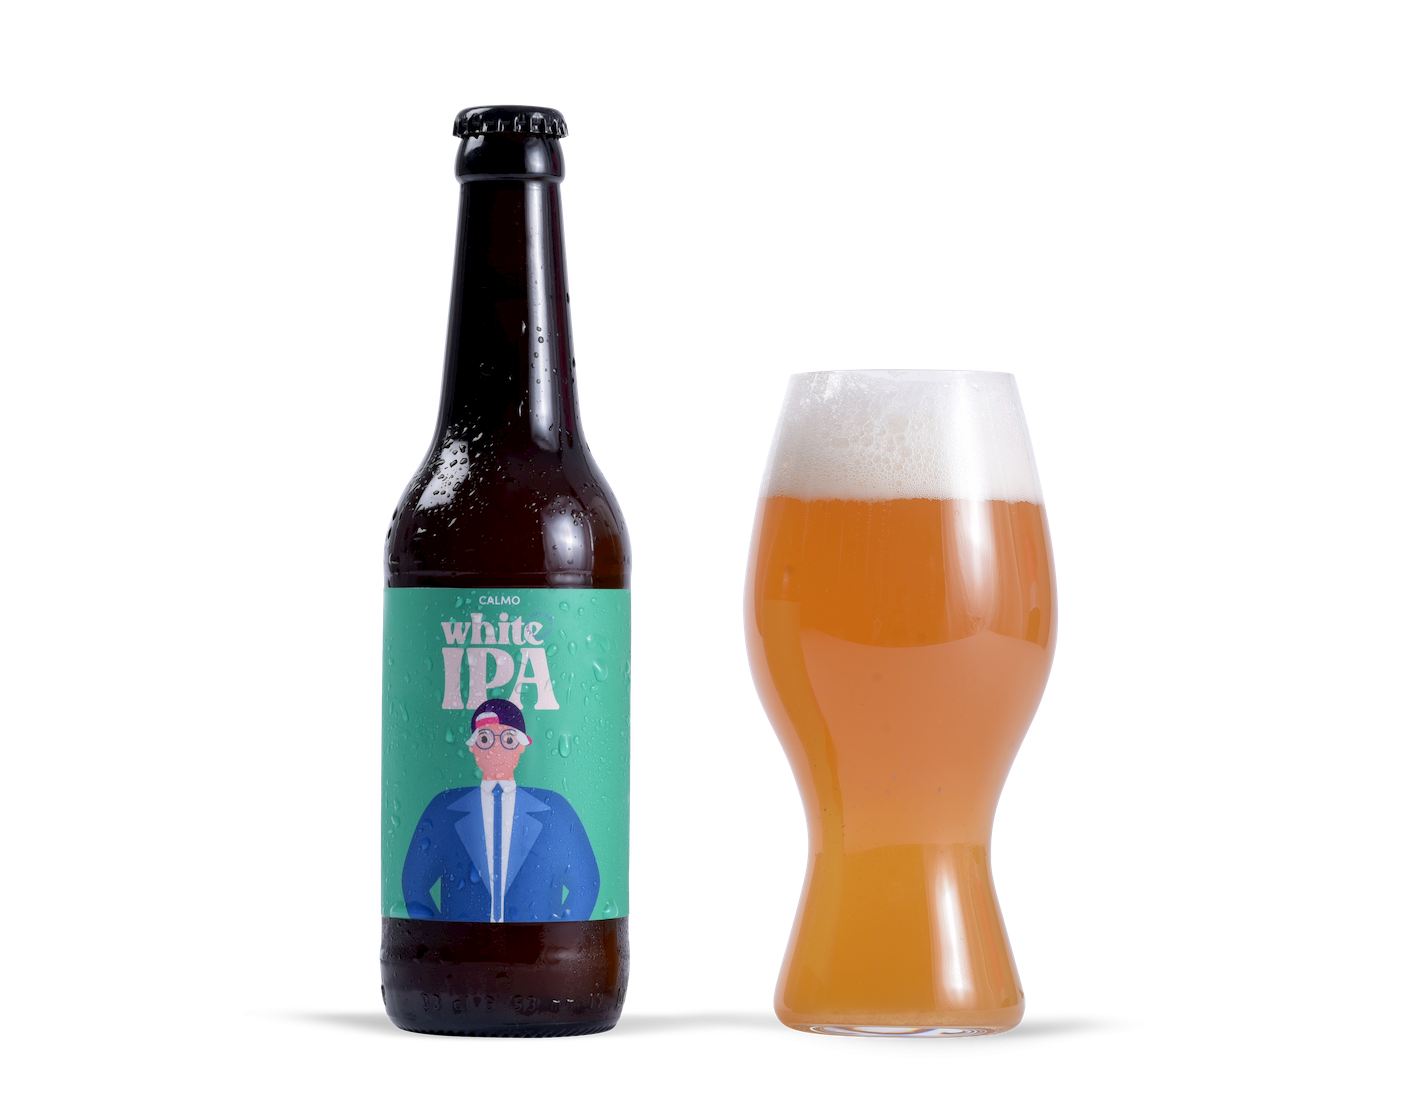 Vaso cerveza White IPA